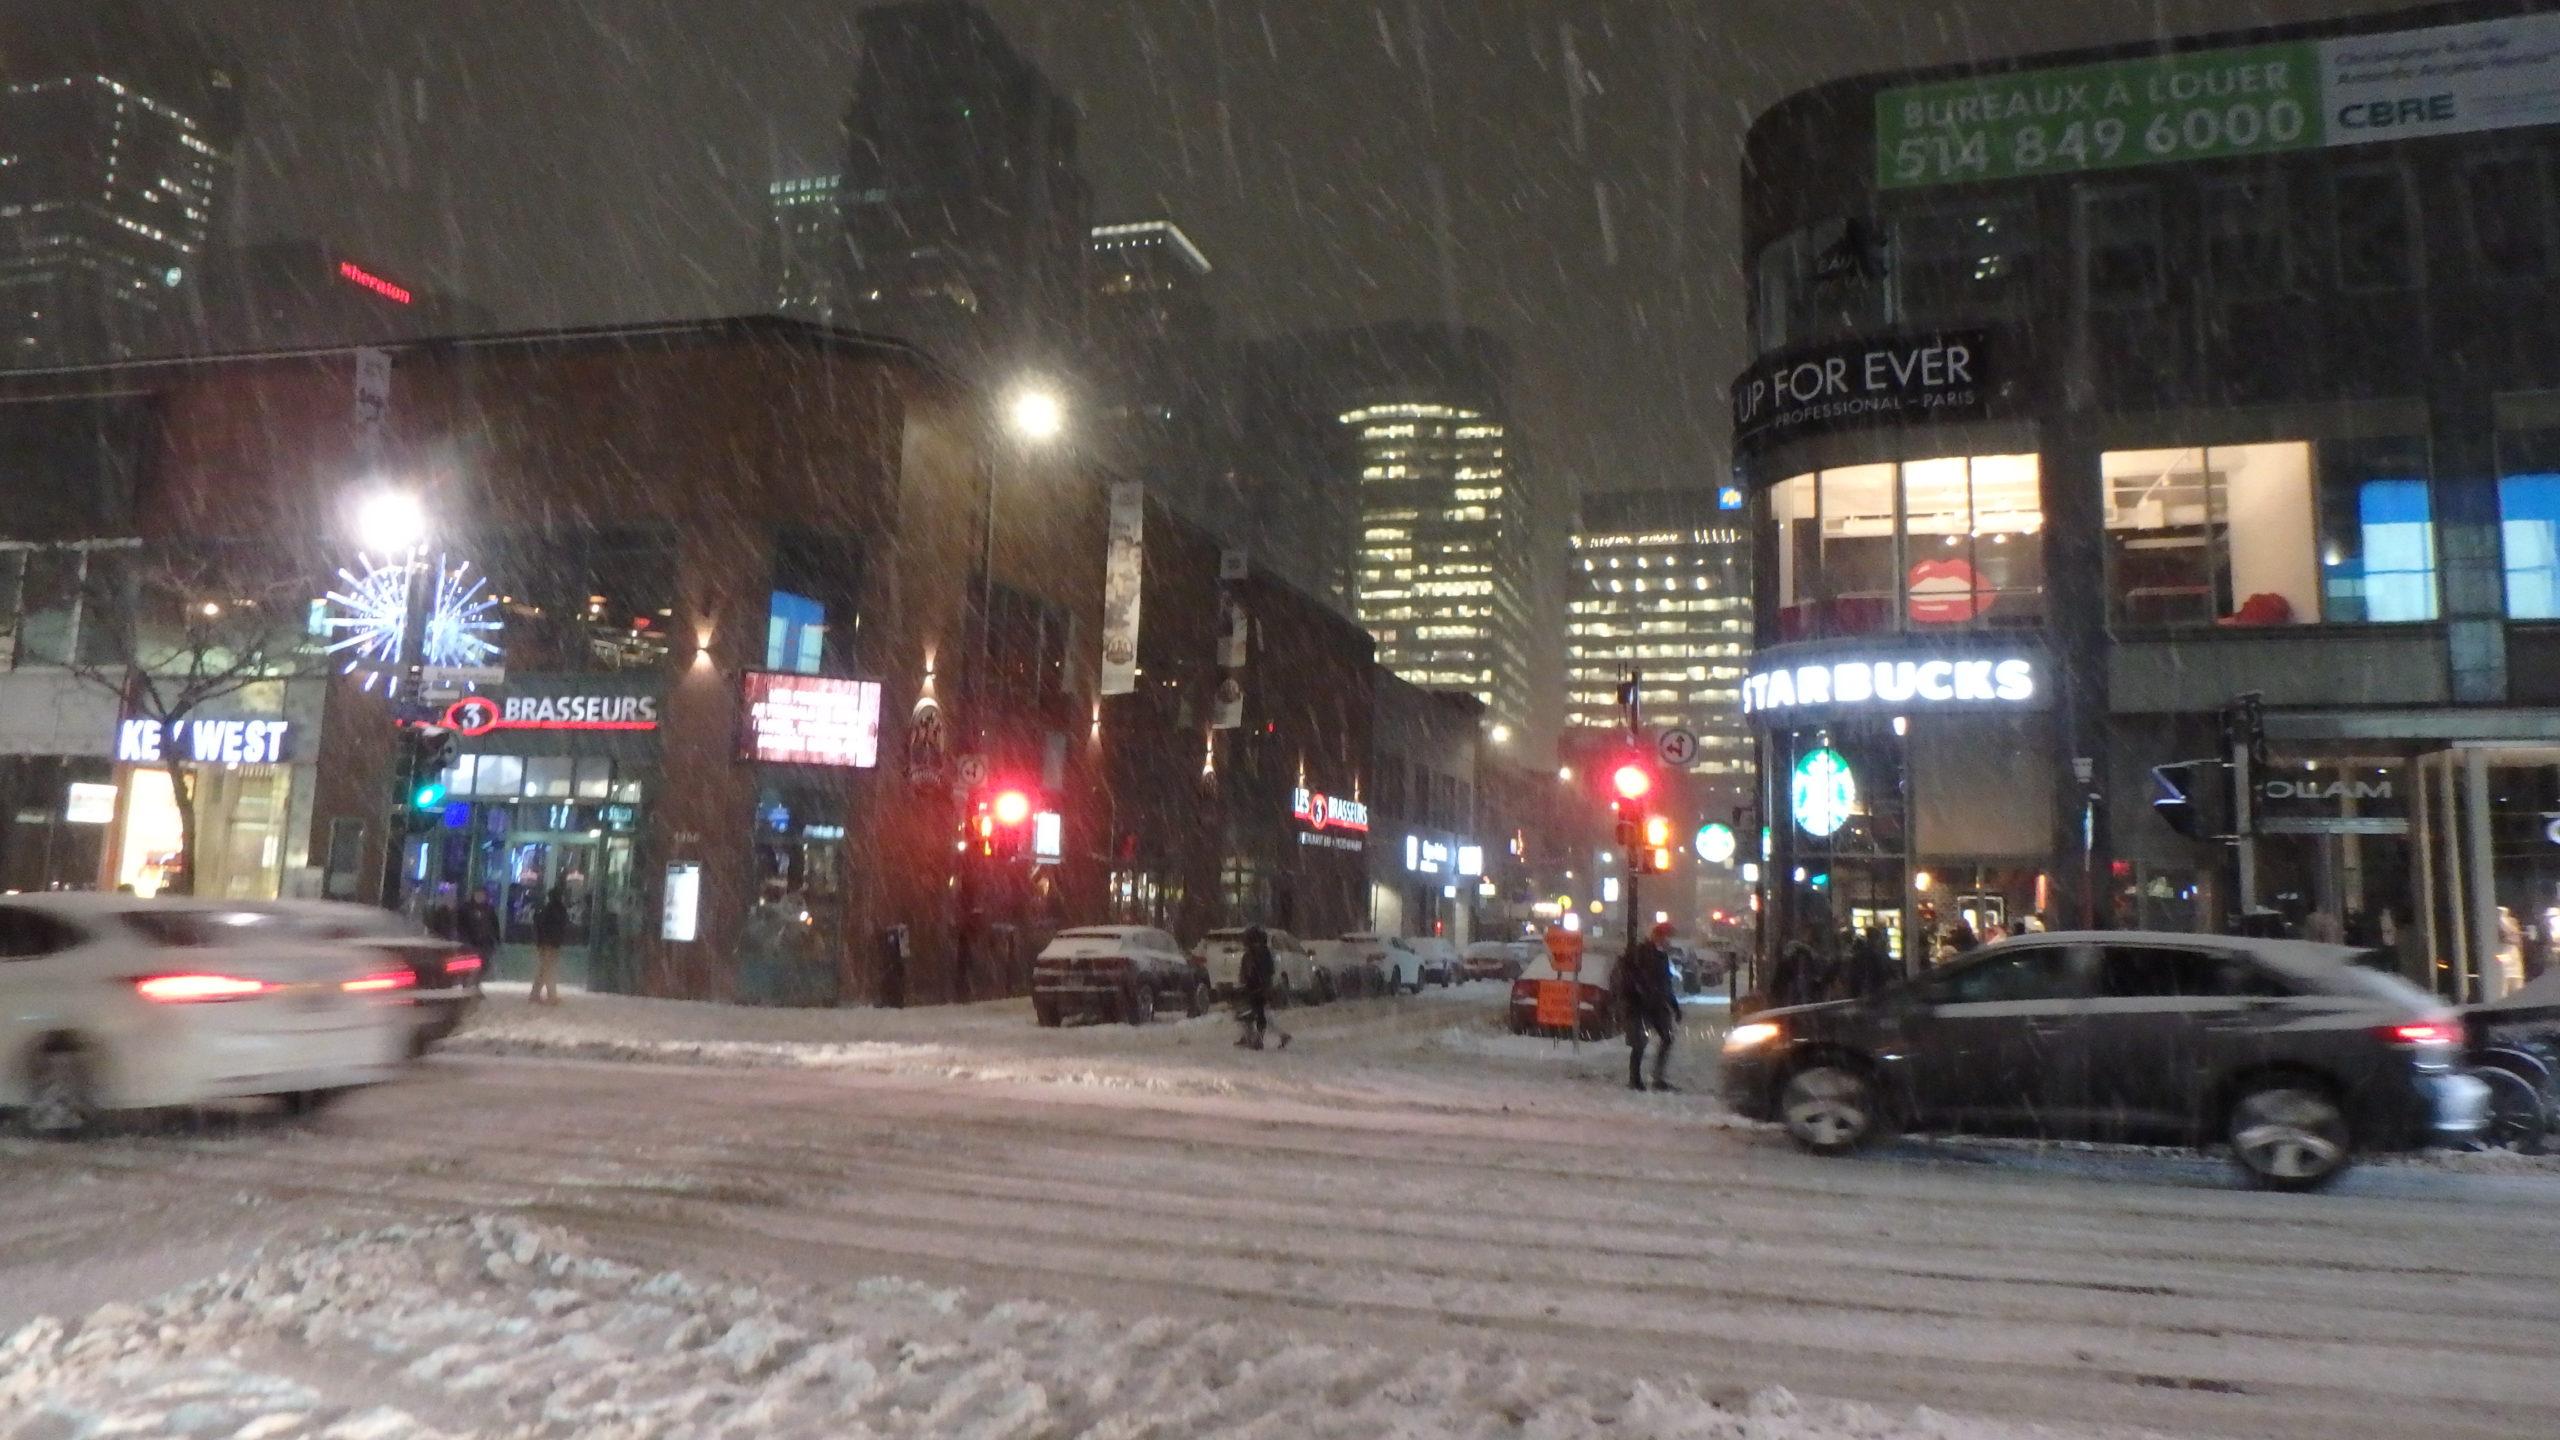 Rue Sainte Catherine sous la neige.